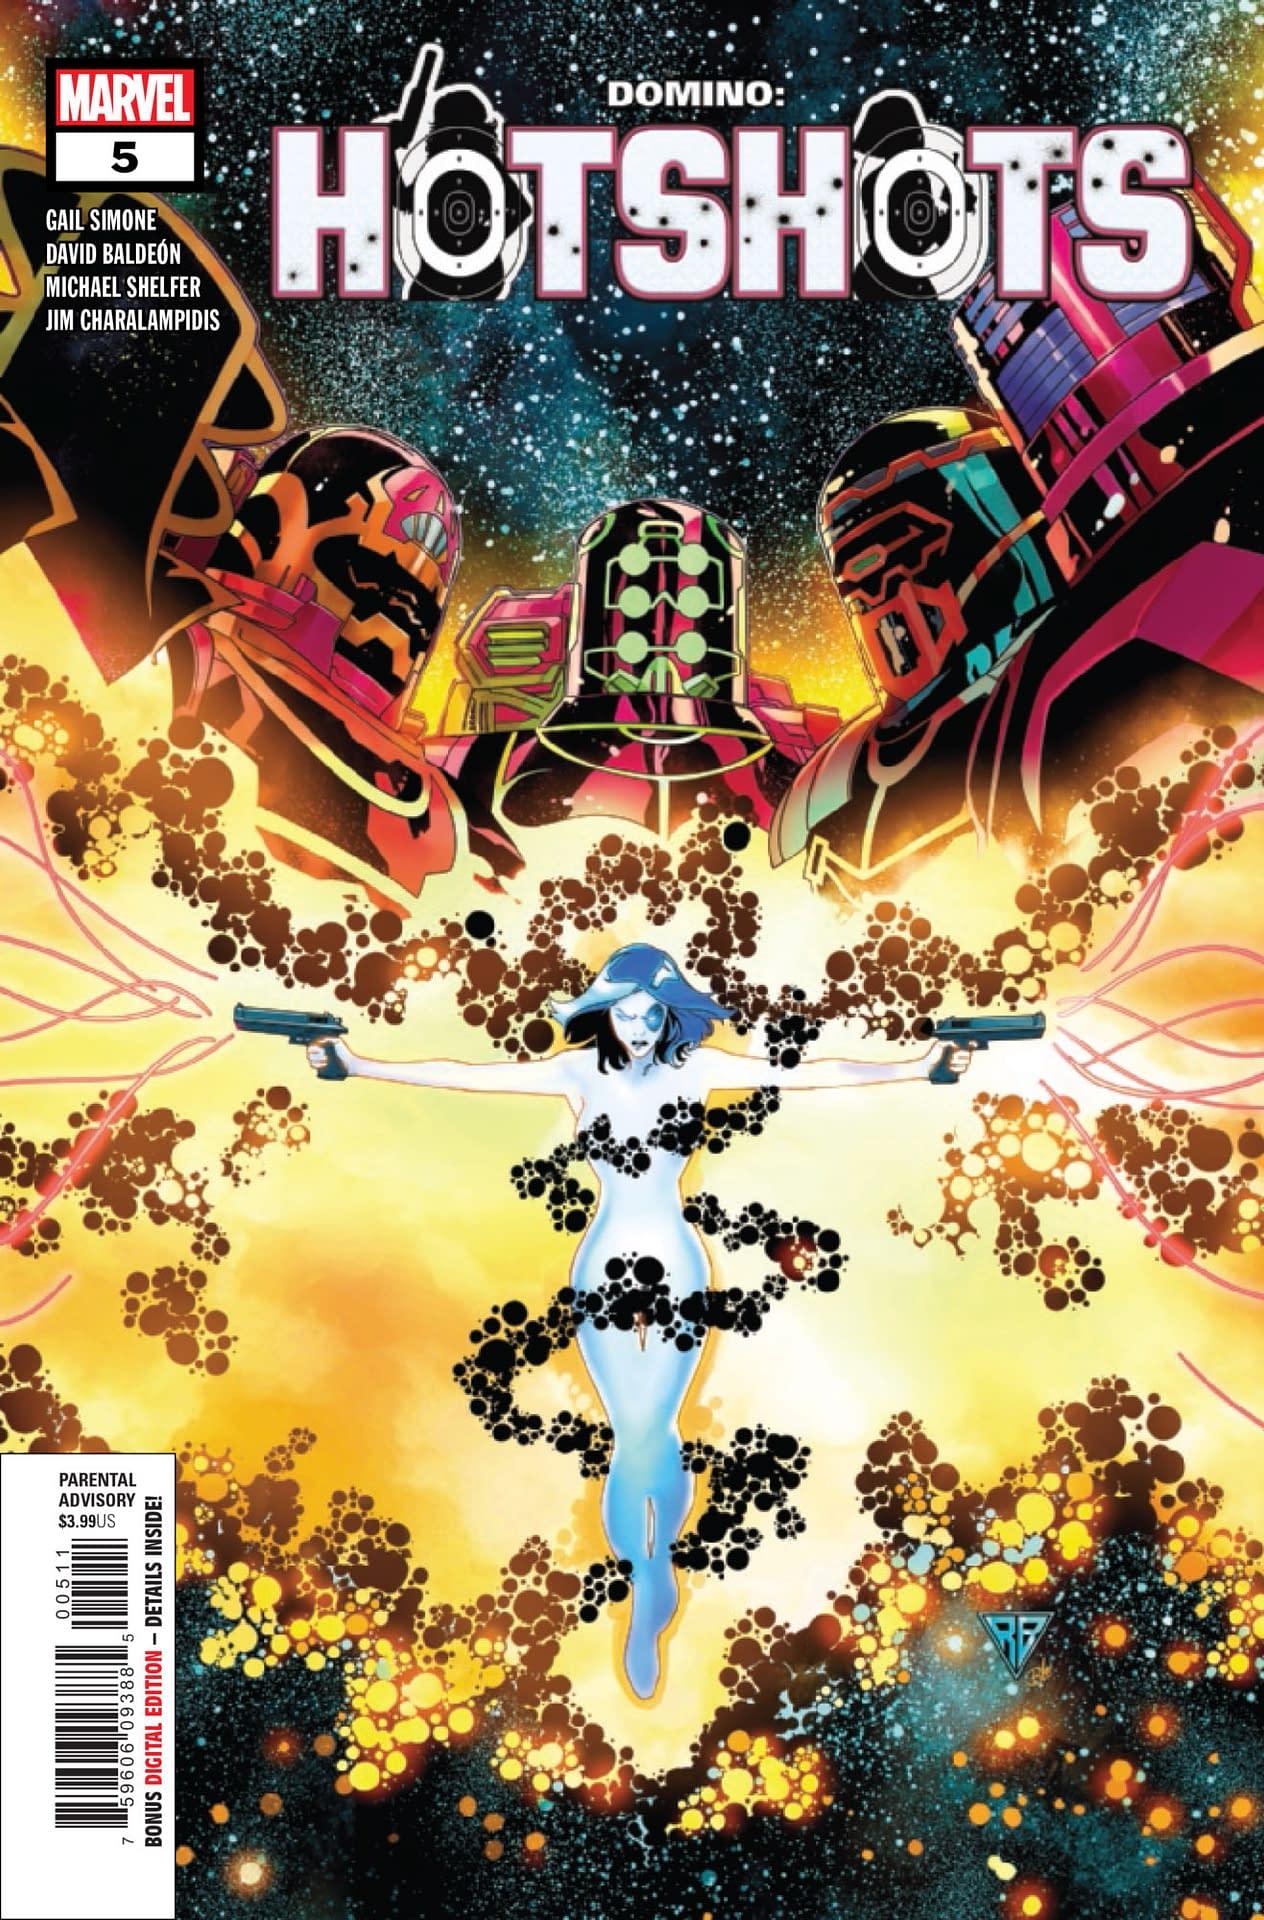 Domino Hotshots #5: The Final Showdown [Preview]